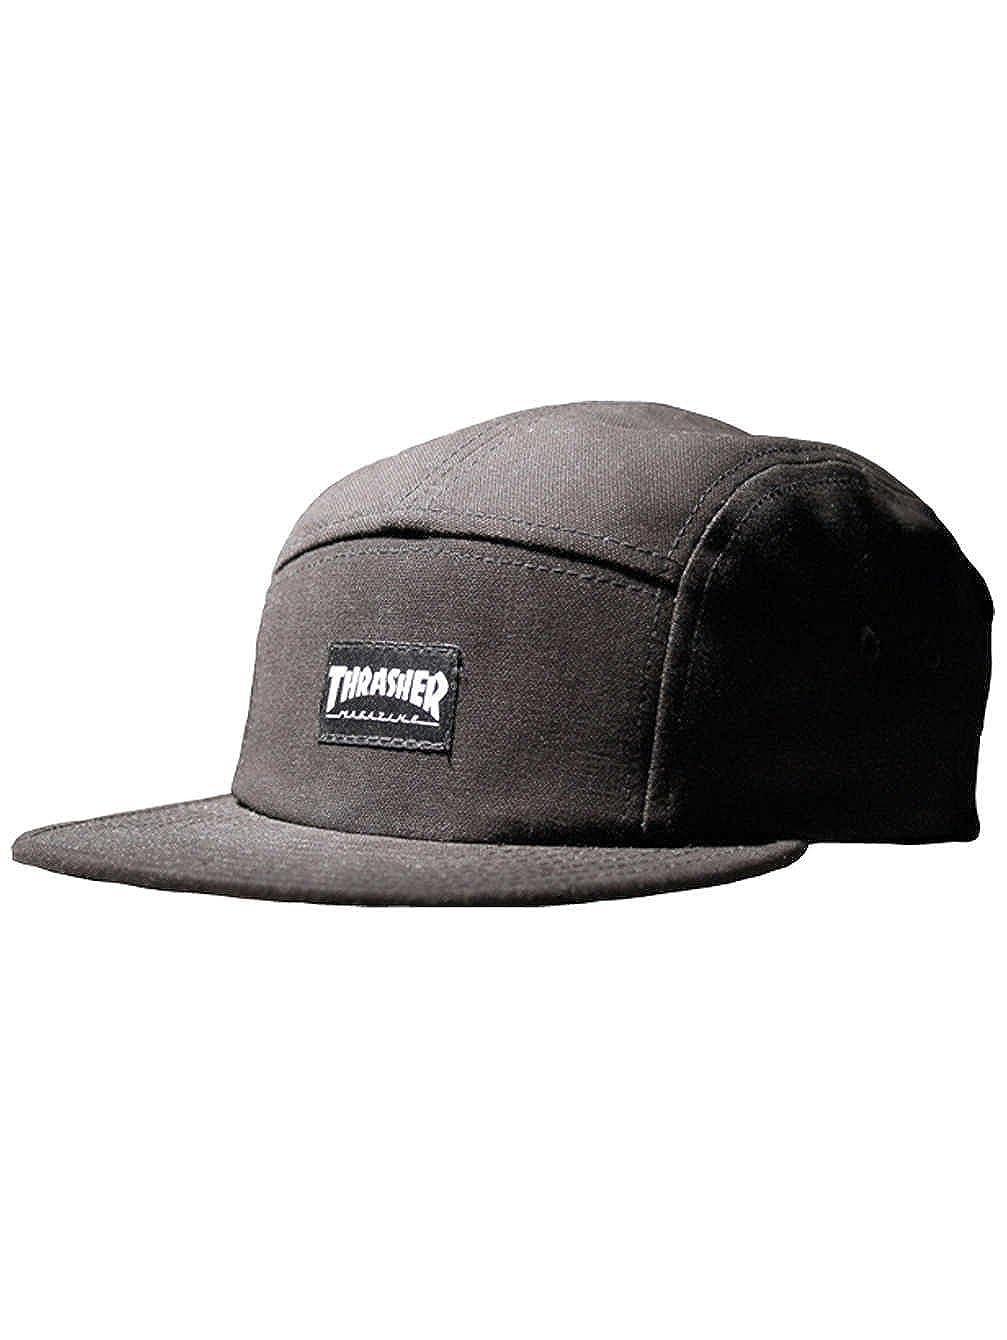 Thrasher Logo 5 Panel Camp Hat Black (Black) at Amazon Men s Clothing store  b9fb2266ac5